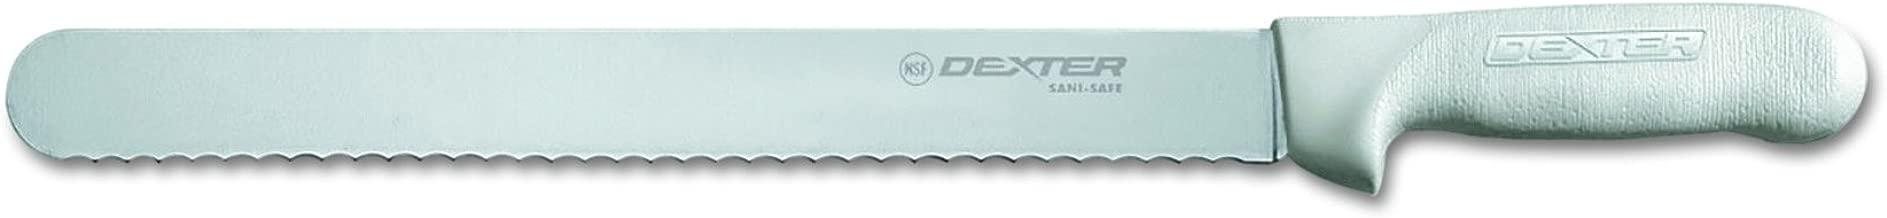 Dexter-Russell Sani-Safe Scalloped Roast Slicer, Carbon Steel Blade, 12-Inch